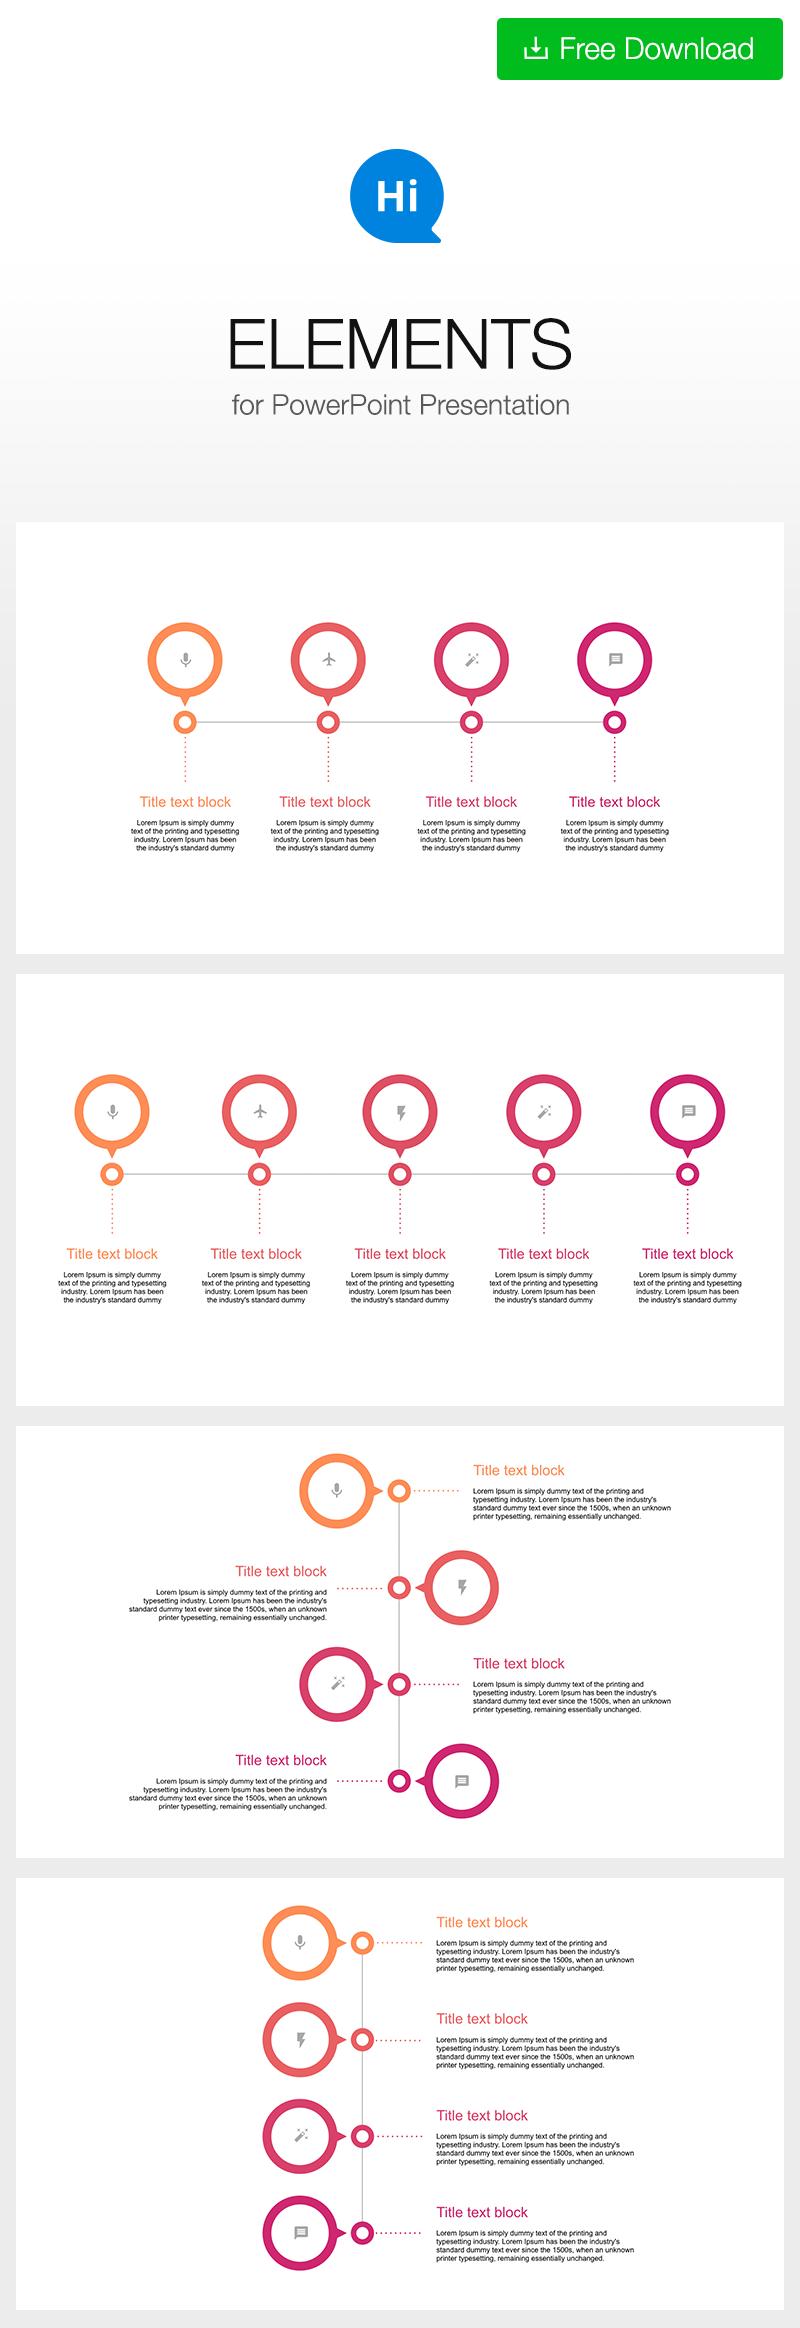 Free Timeline Template For Powerpoint Ppt Download Hislide Io Infograp Downl In 2020 Zeitleiste Design Infografik Illustrationen Infografik